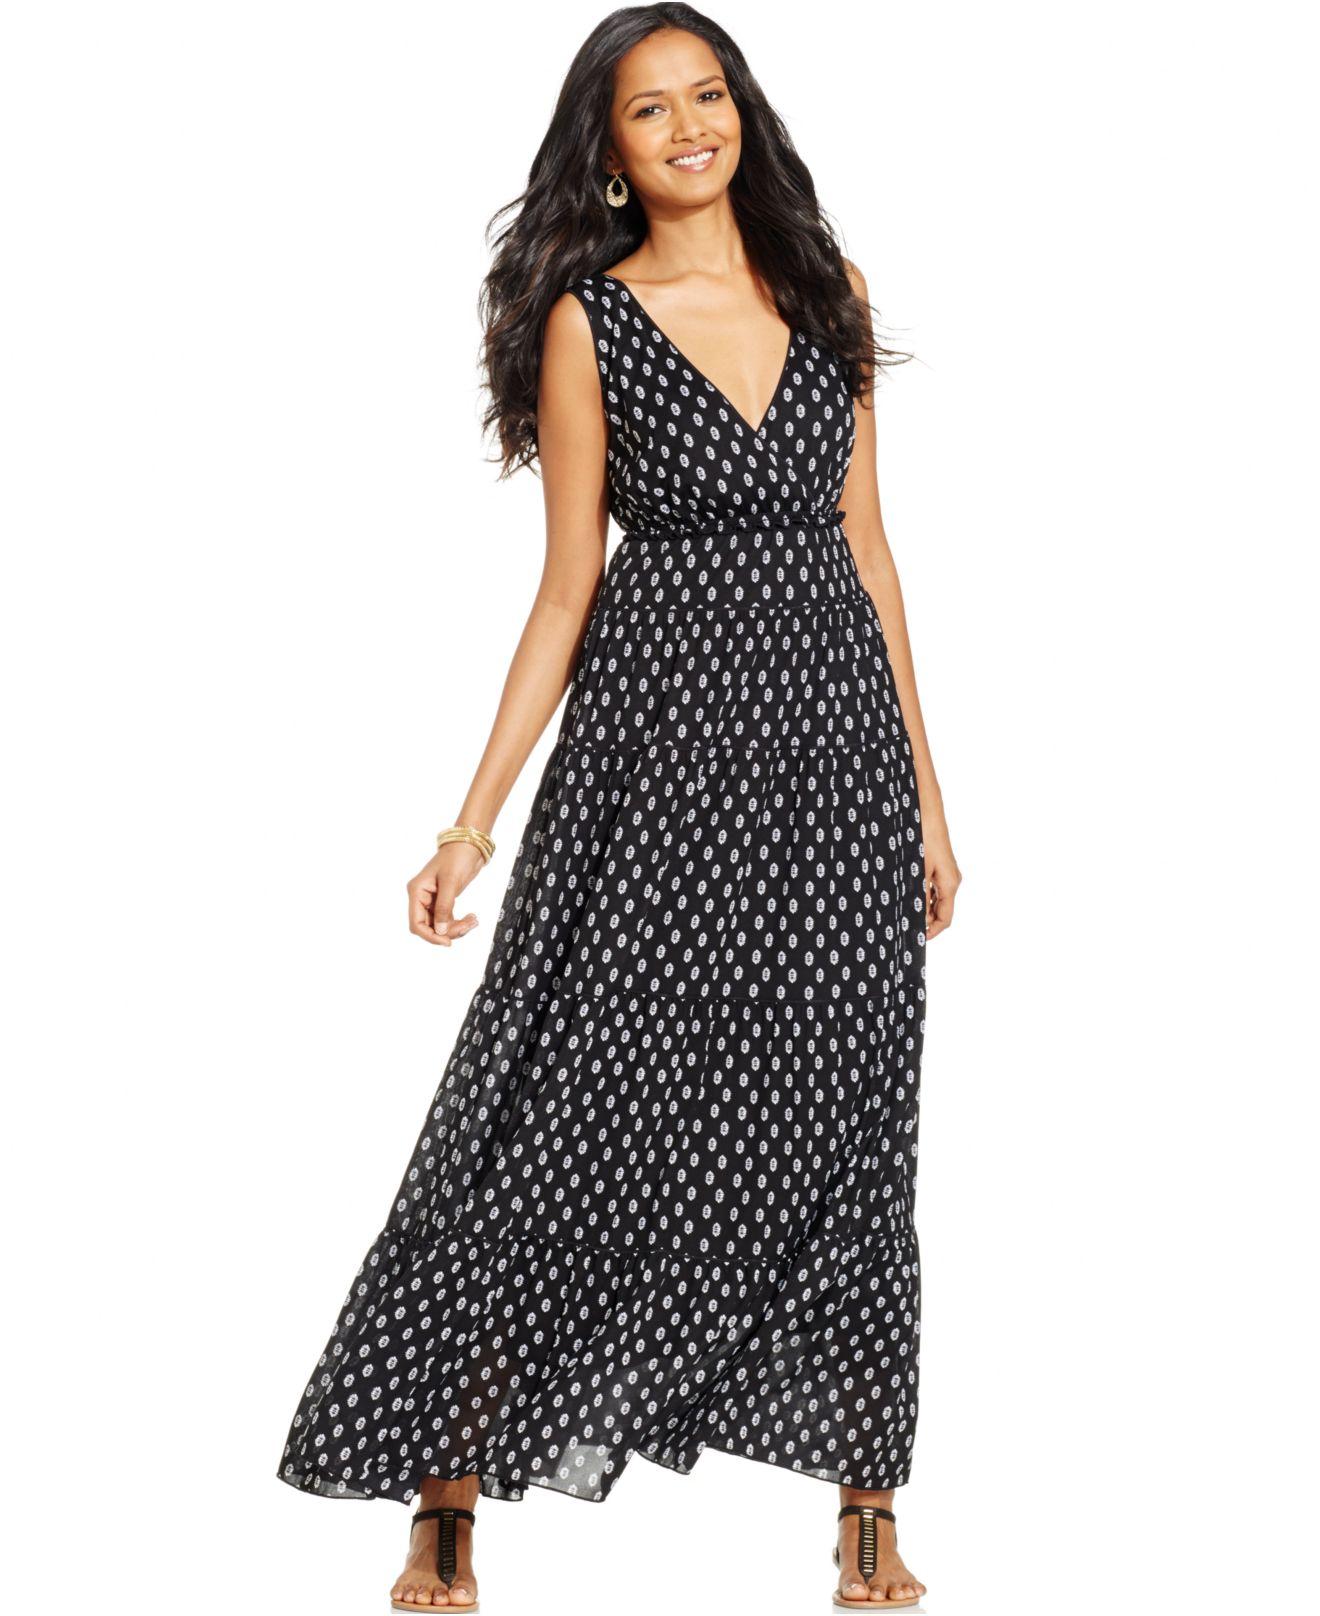 style a maxi dress empire